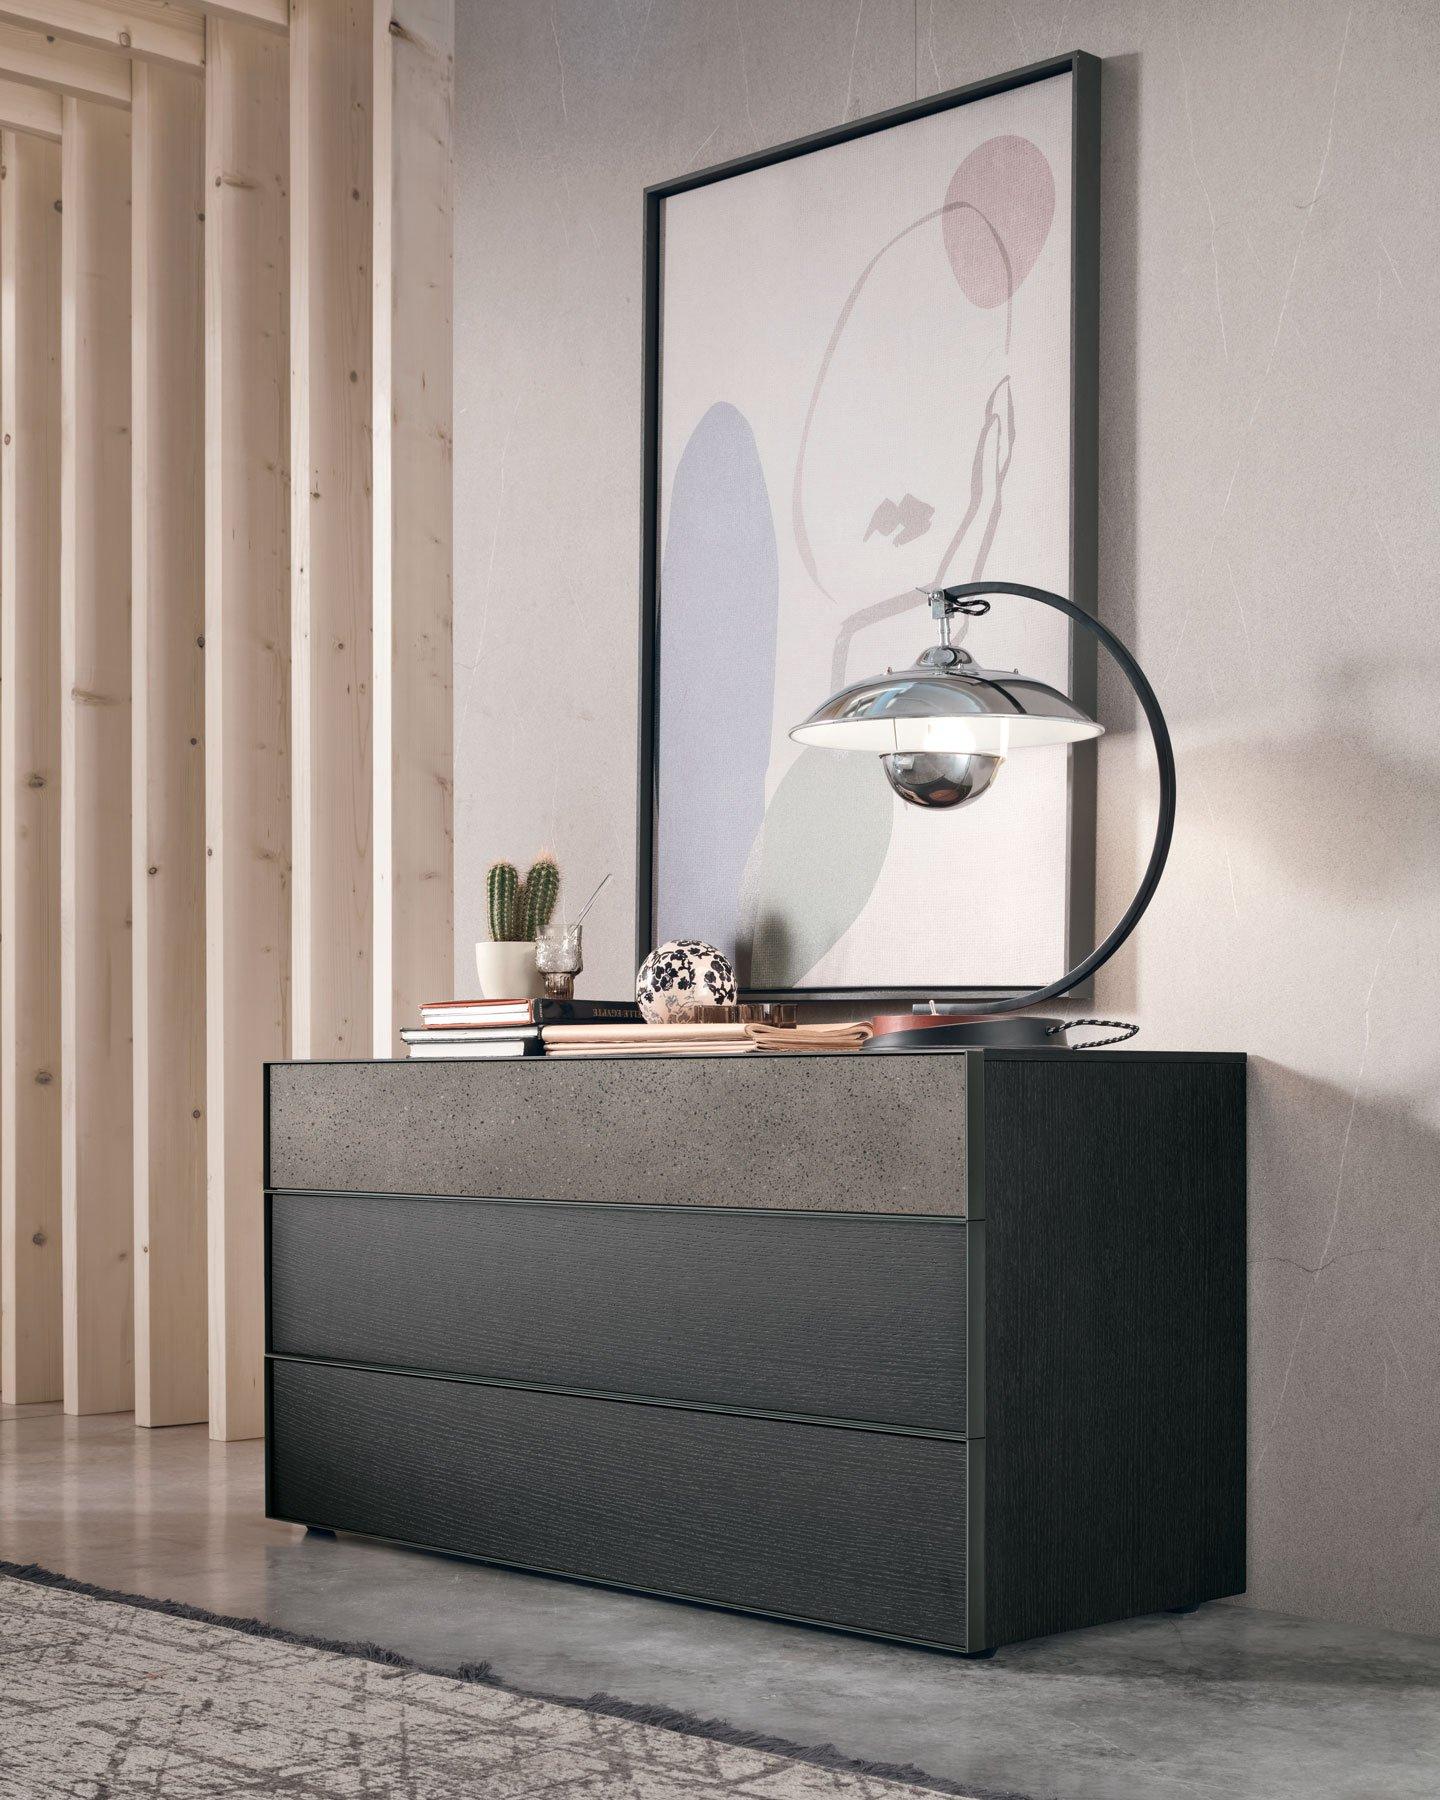 Vinci Storage Unit dresser from Tomasella